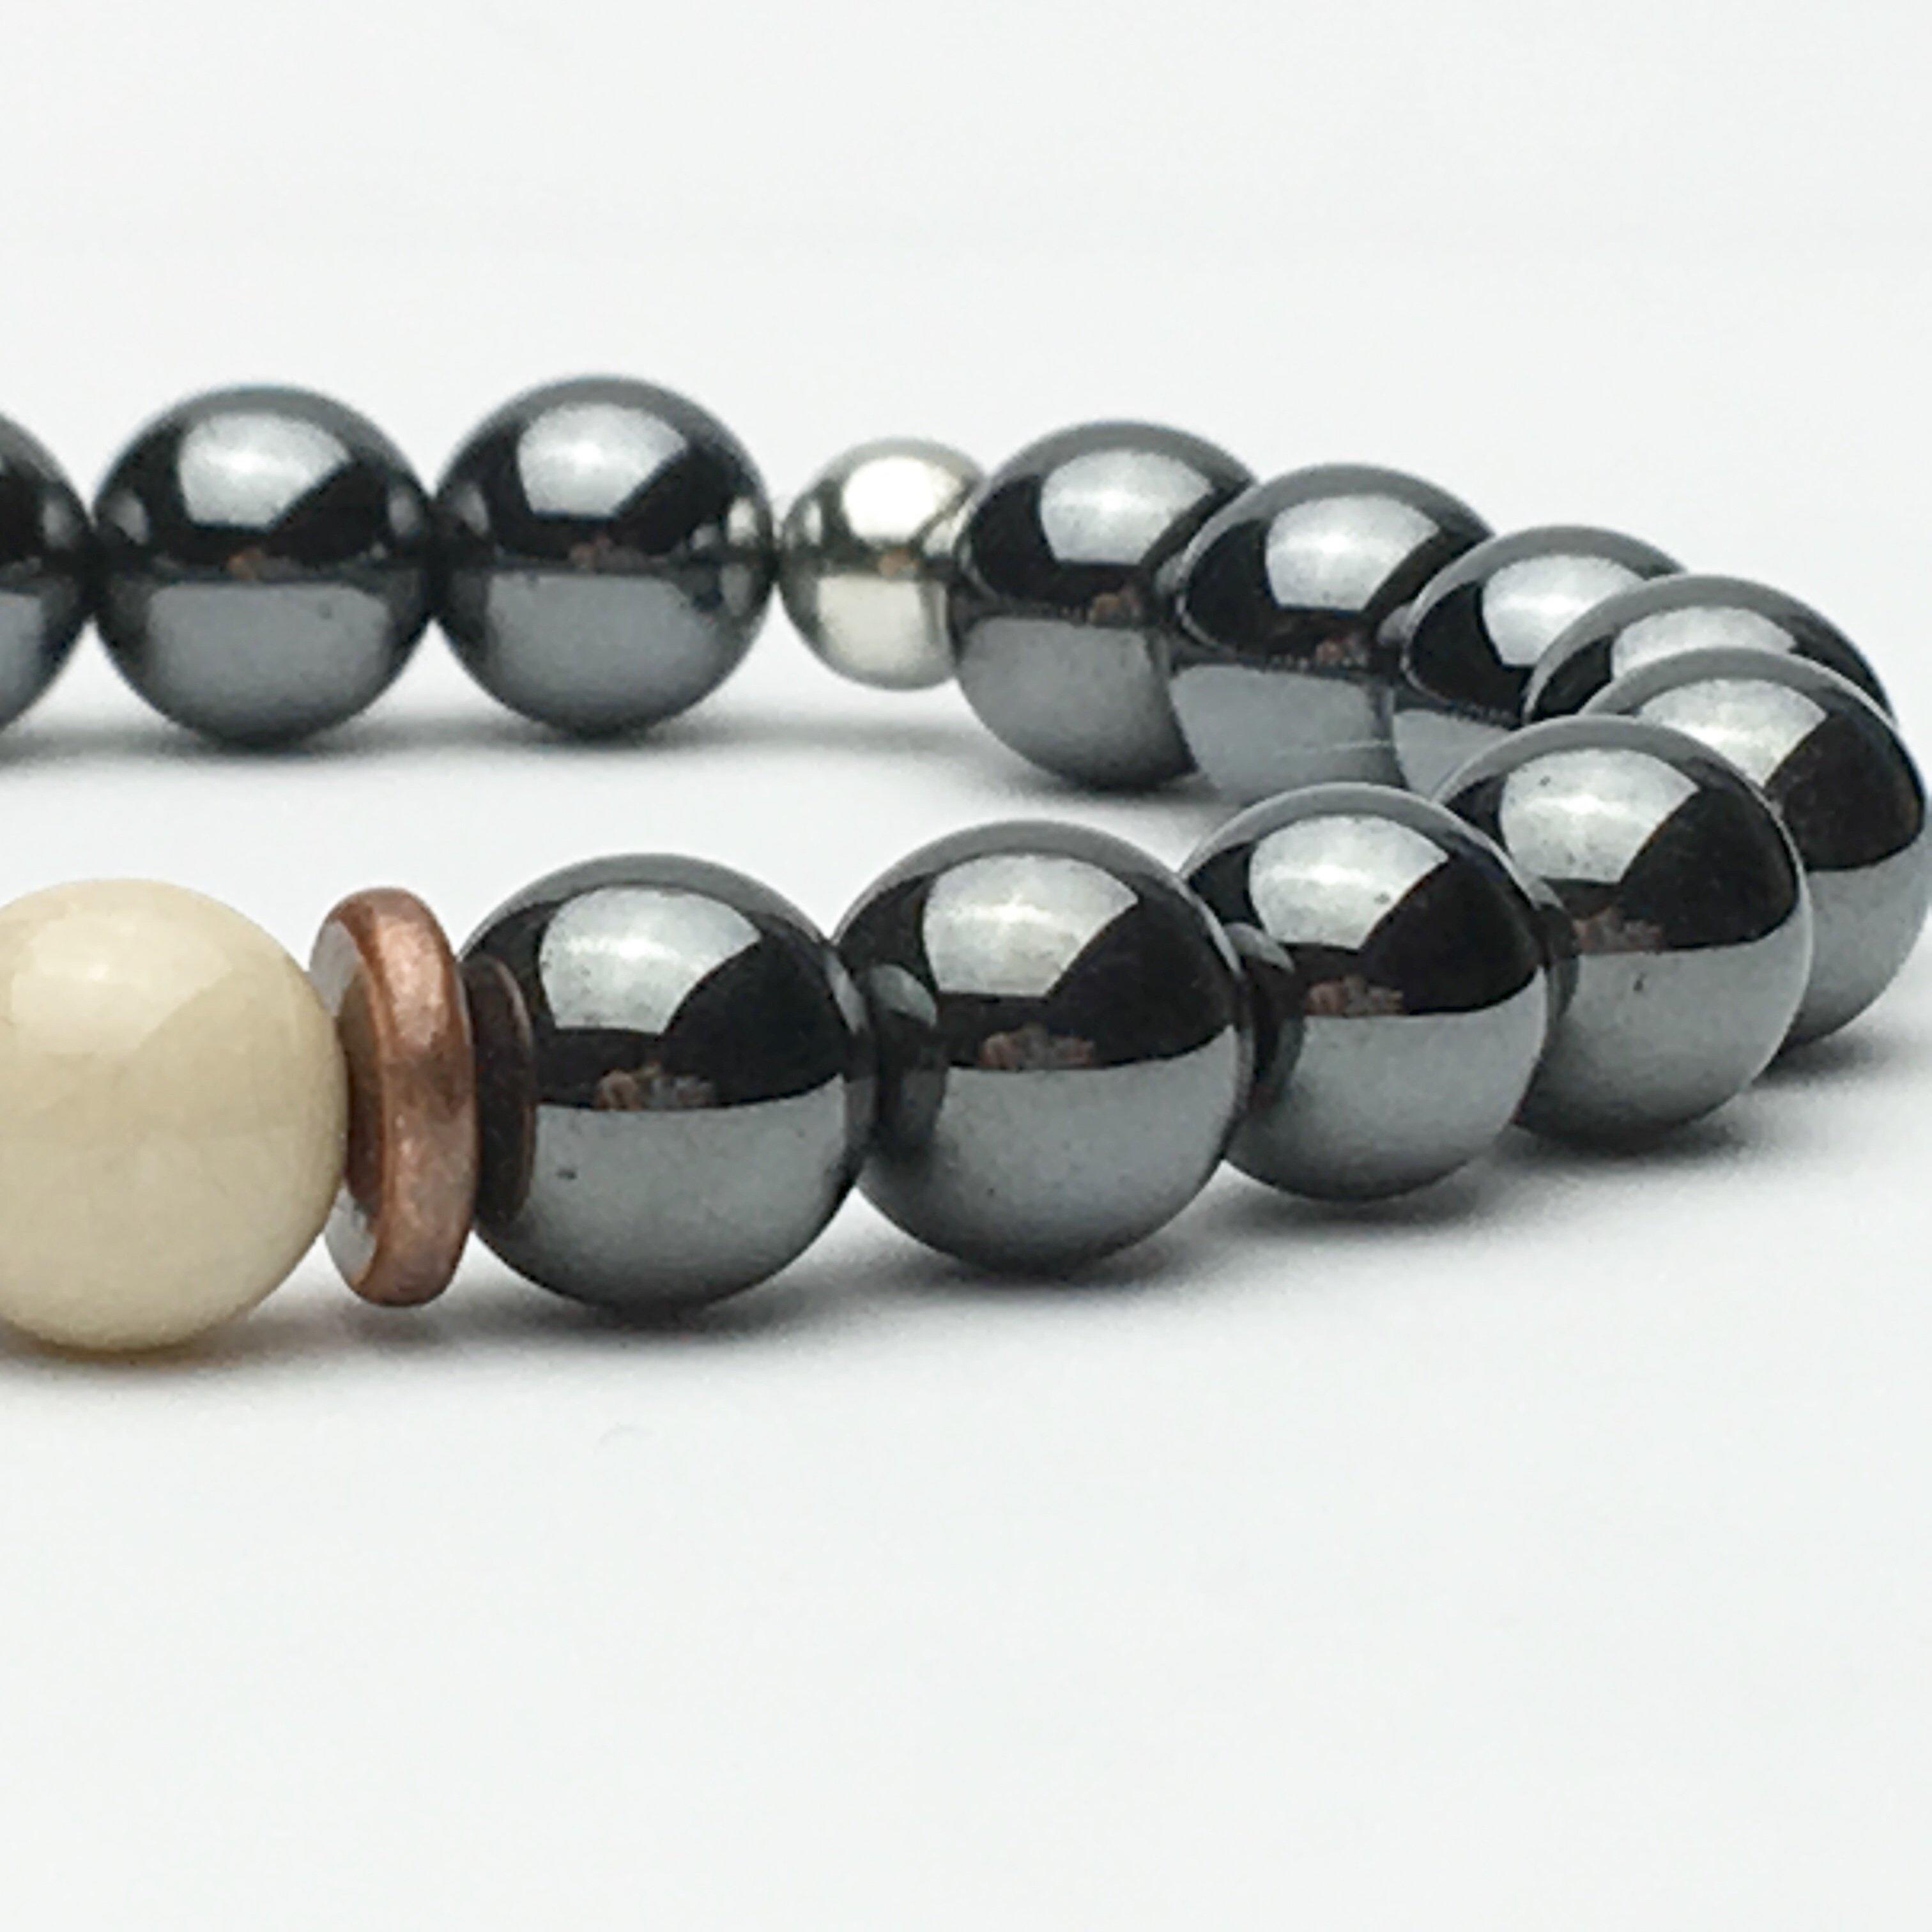 Fossil Stone and Hematite Bead Bracelet